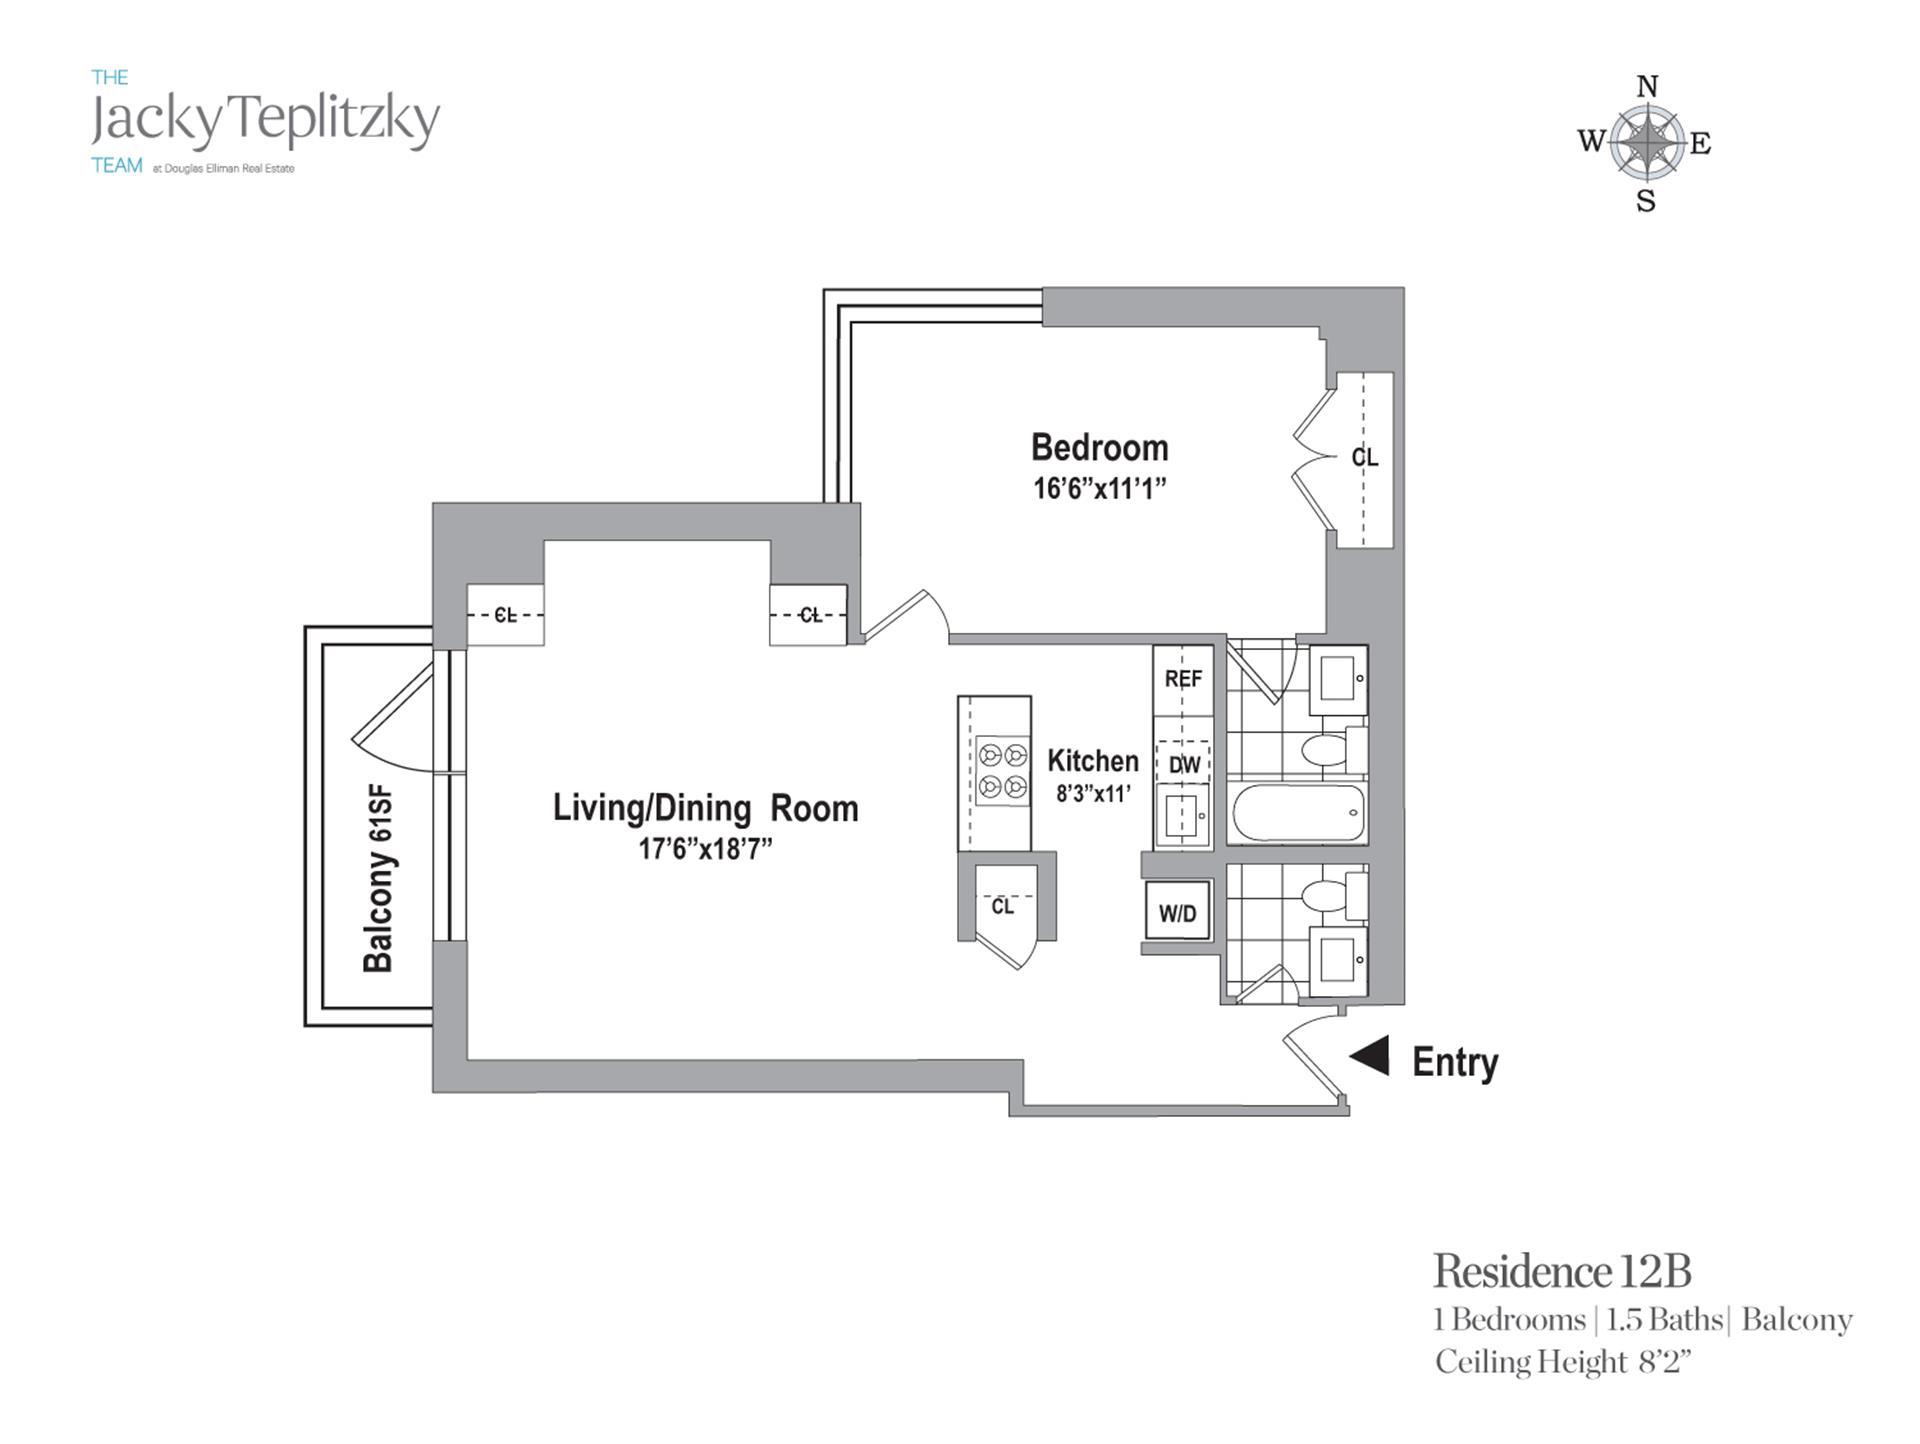 Floor plan of Maison East, 1438 Third Avenue, 12B - Upper East Side, New York